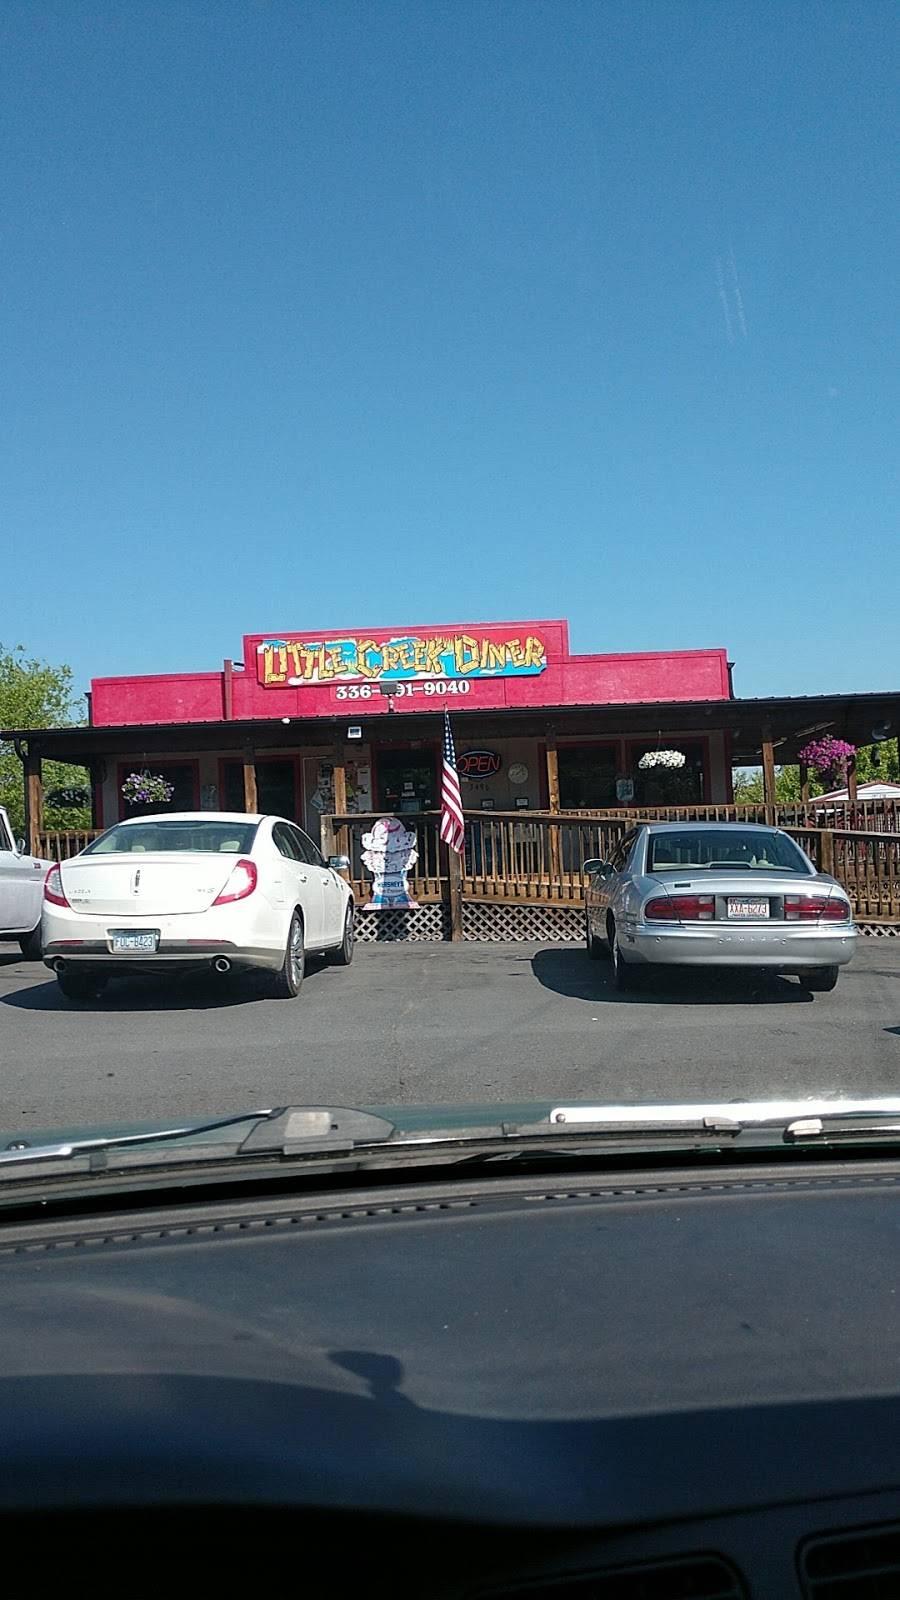 Little Creek Diner | restaurant | 3496 NC-8, Germanton, NC 27019, USA | 3365919040 OR +1 336-591-9040